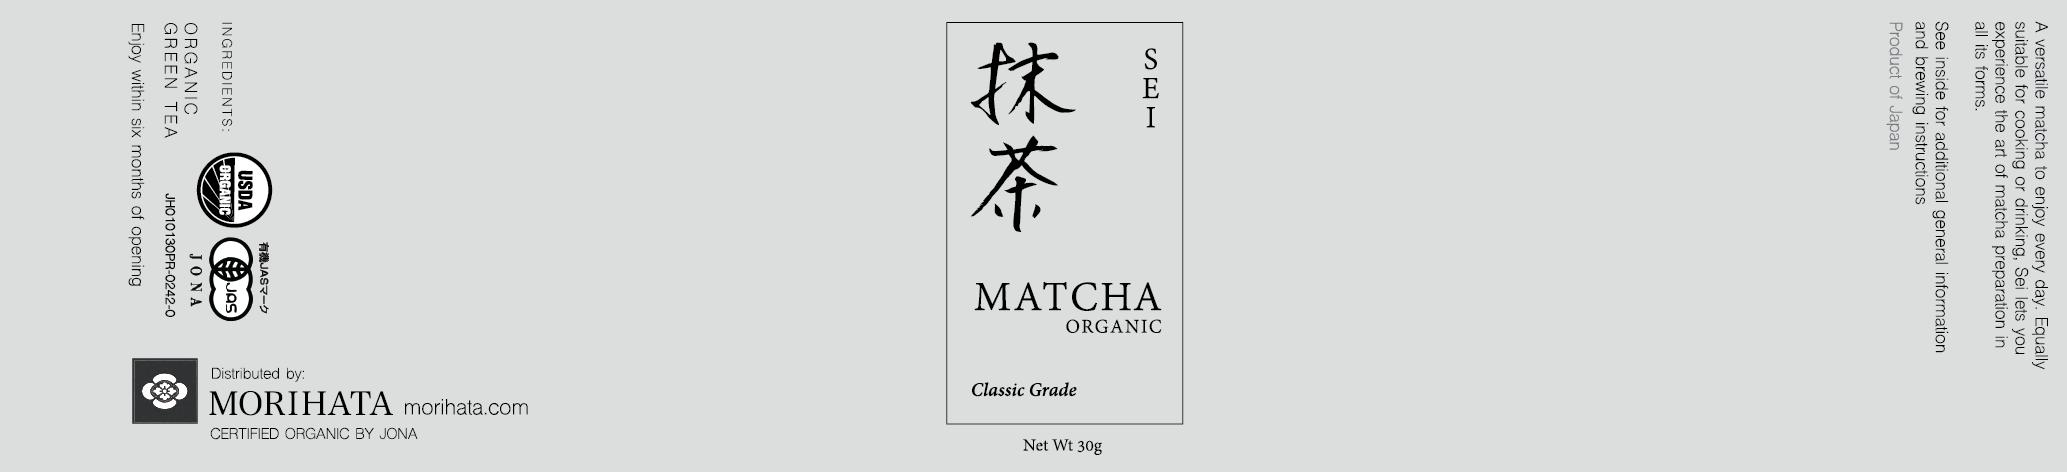 matcha-03.jpg